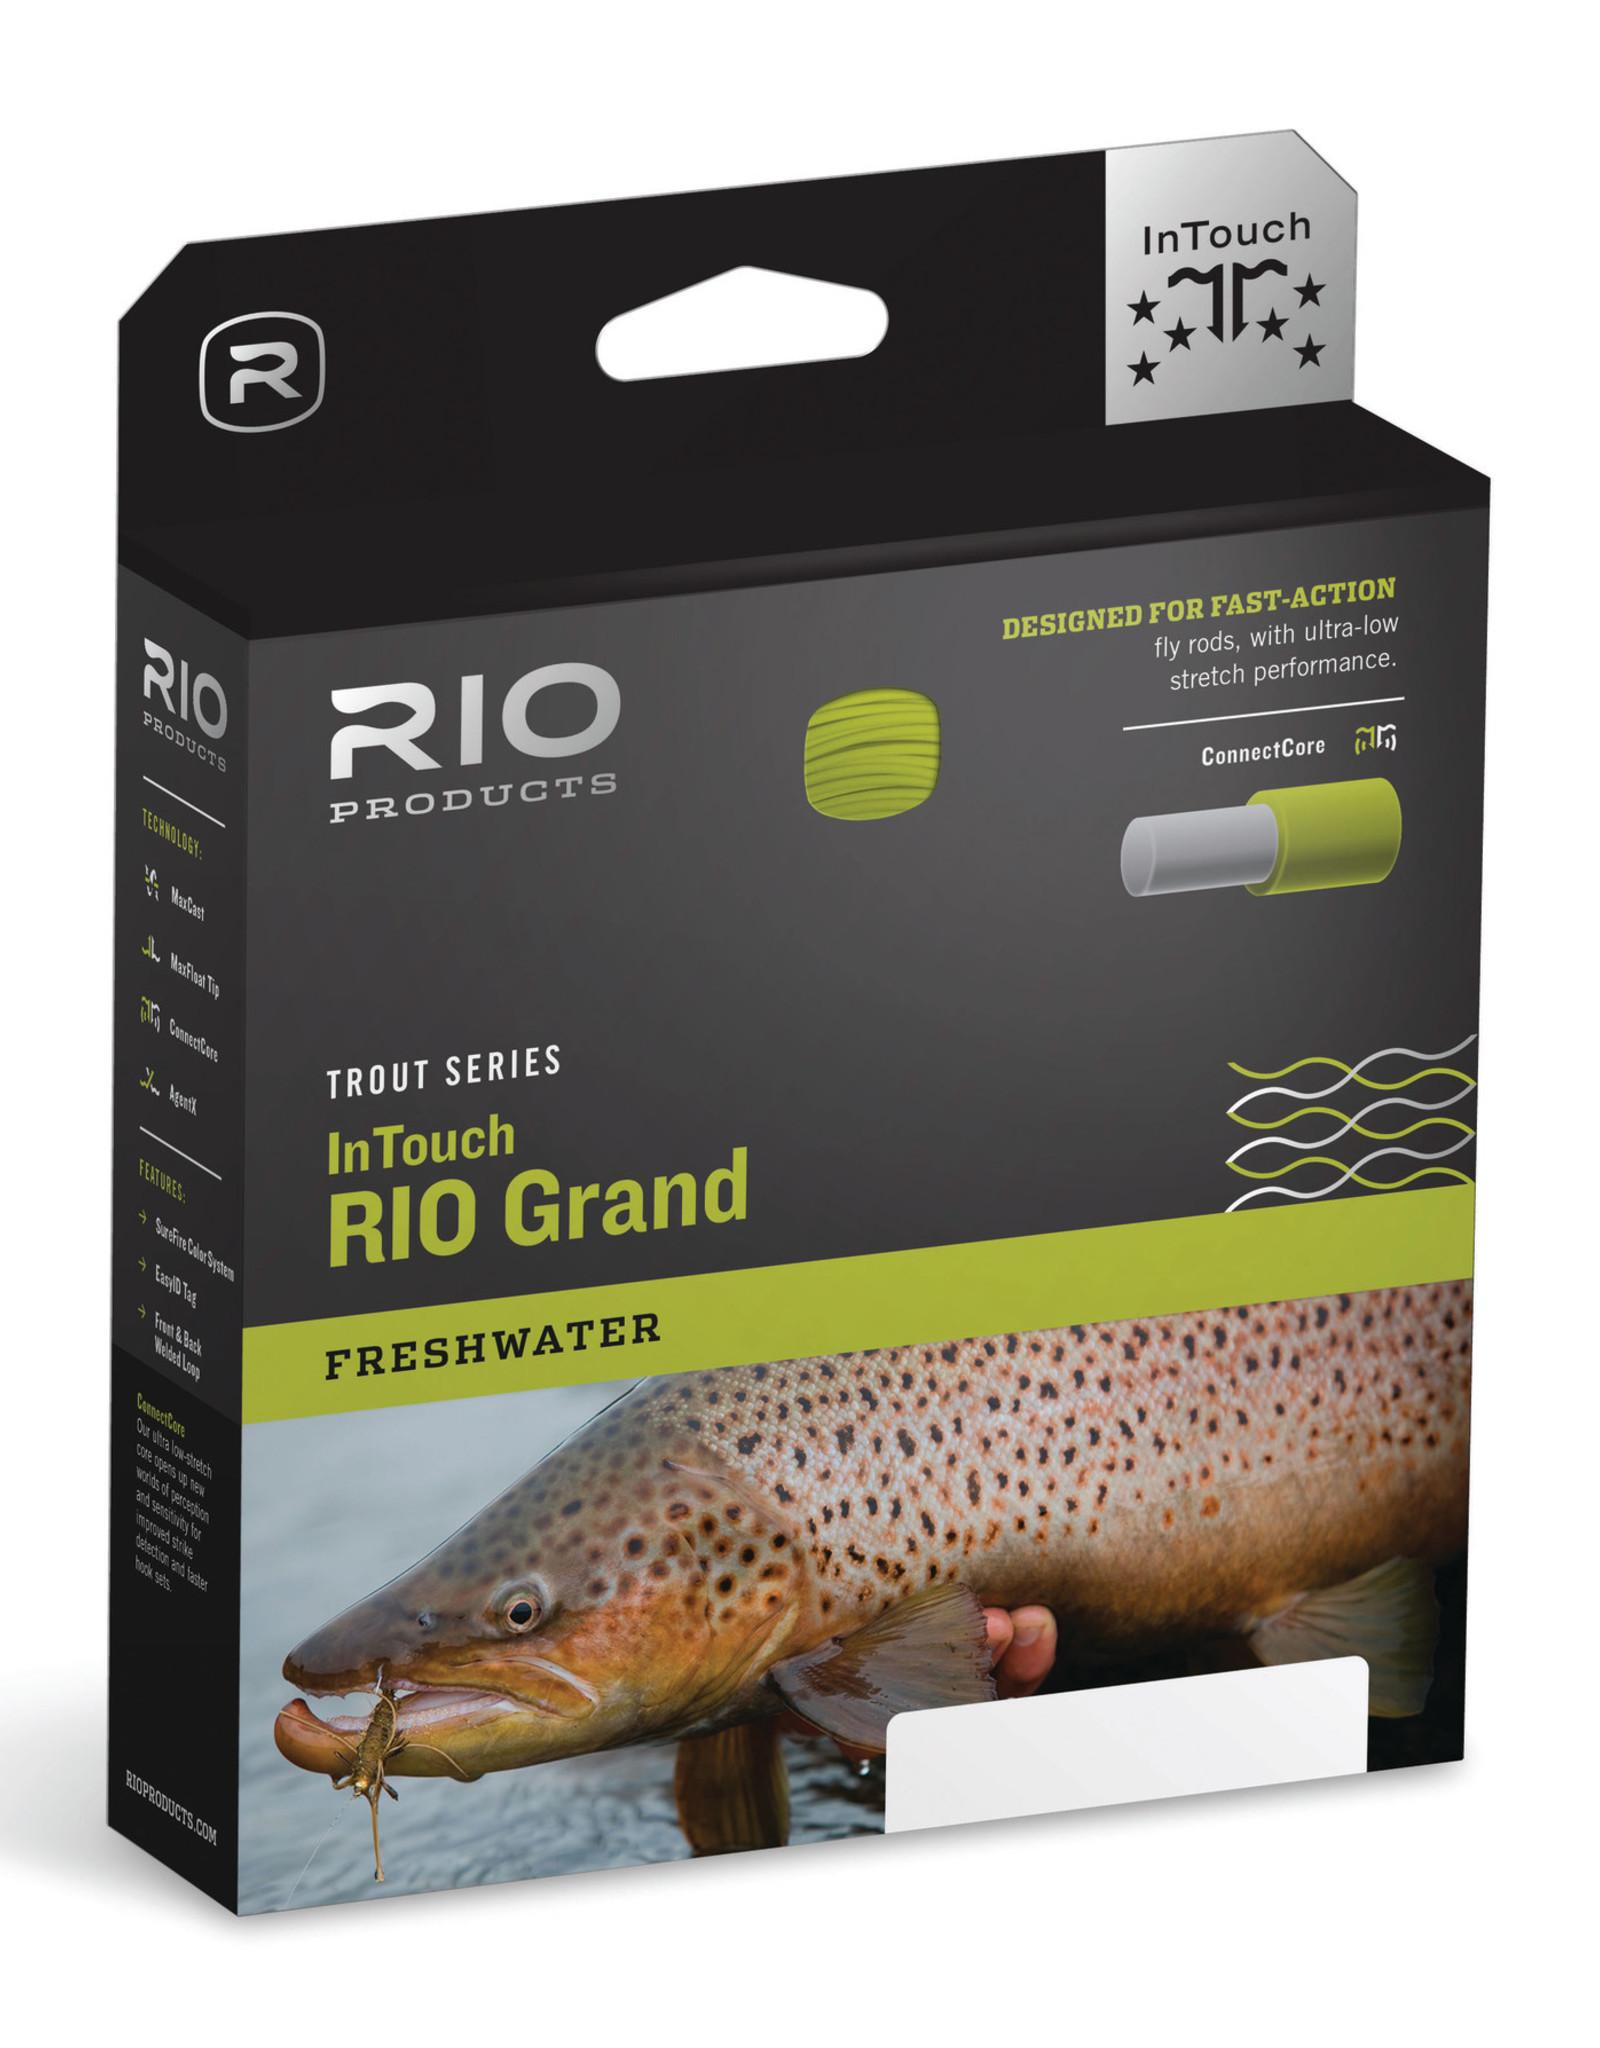 RIO Products InTouch RIO Grand